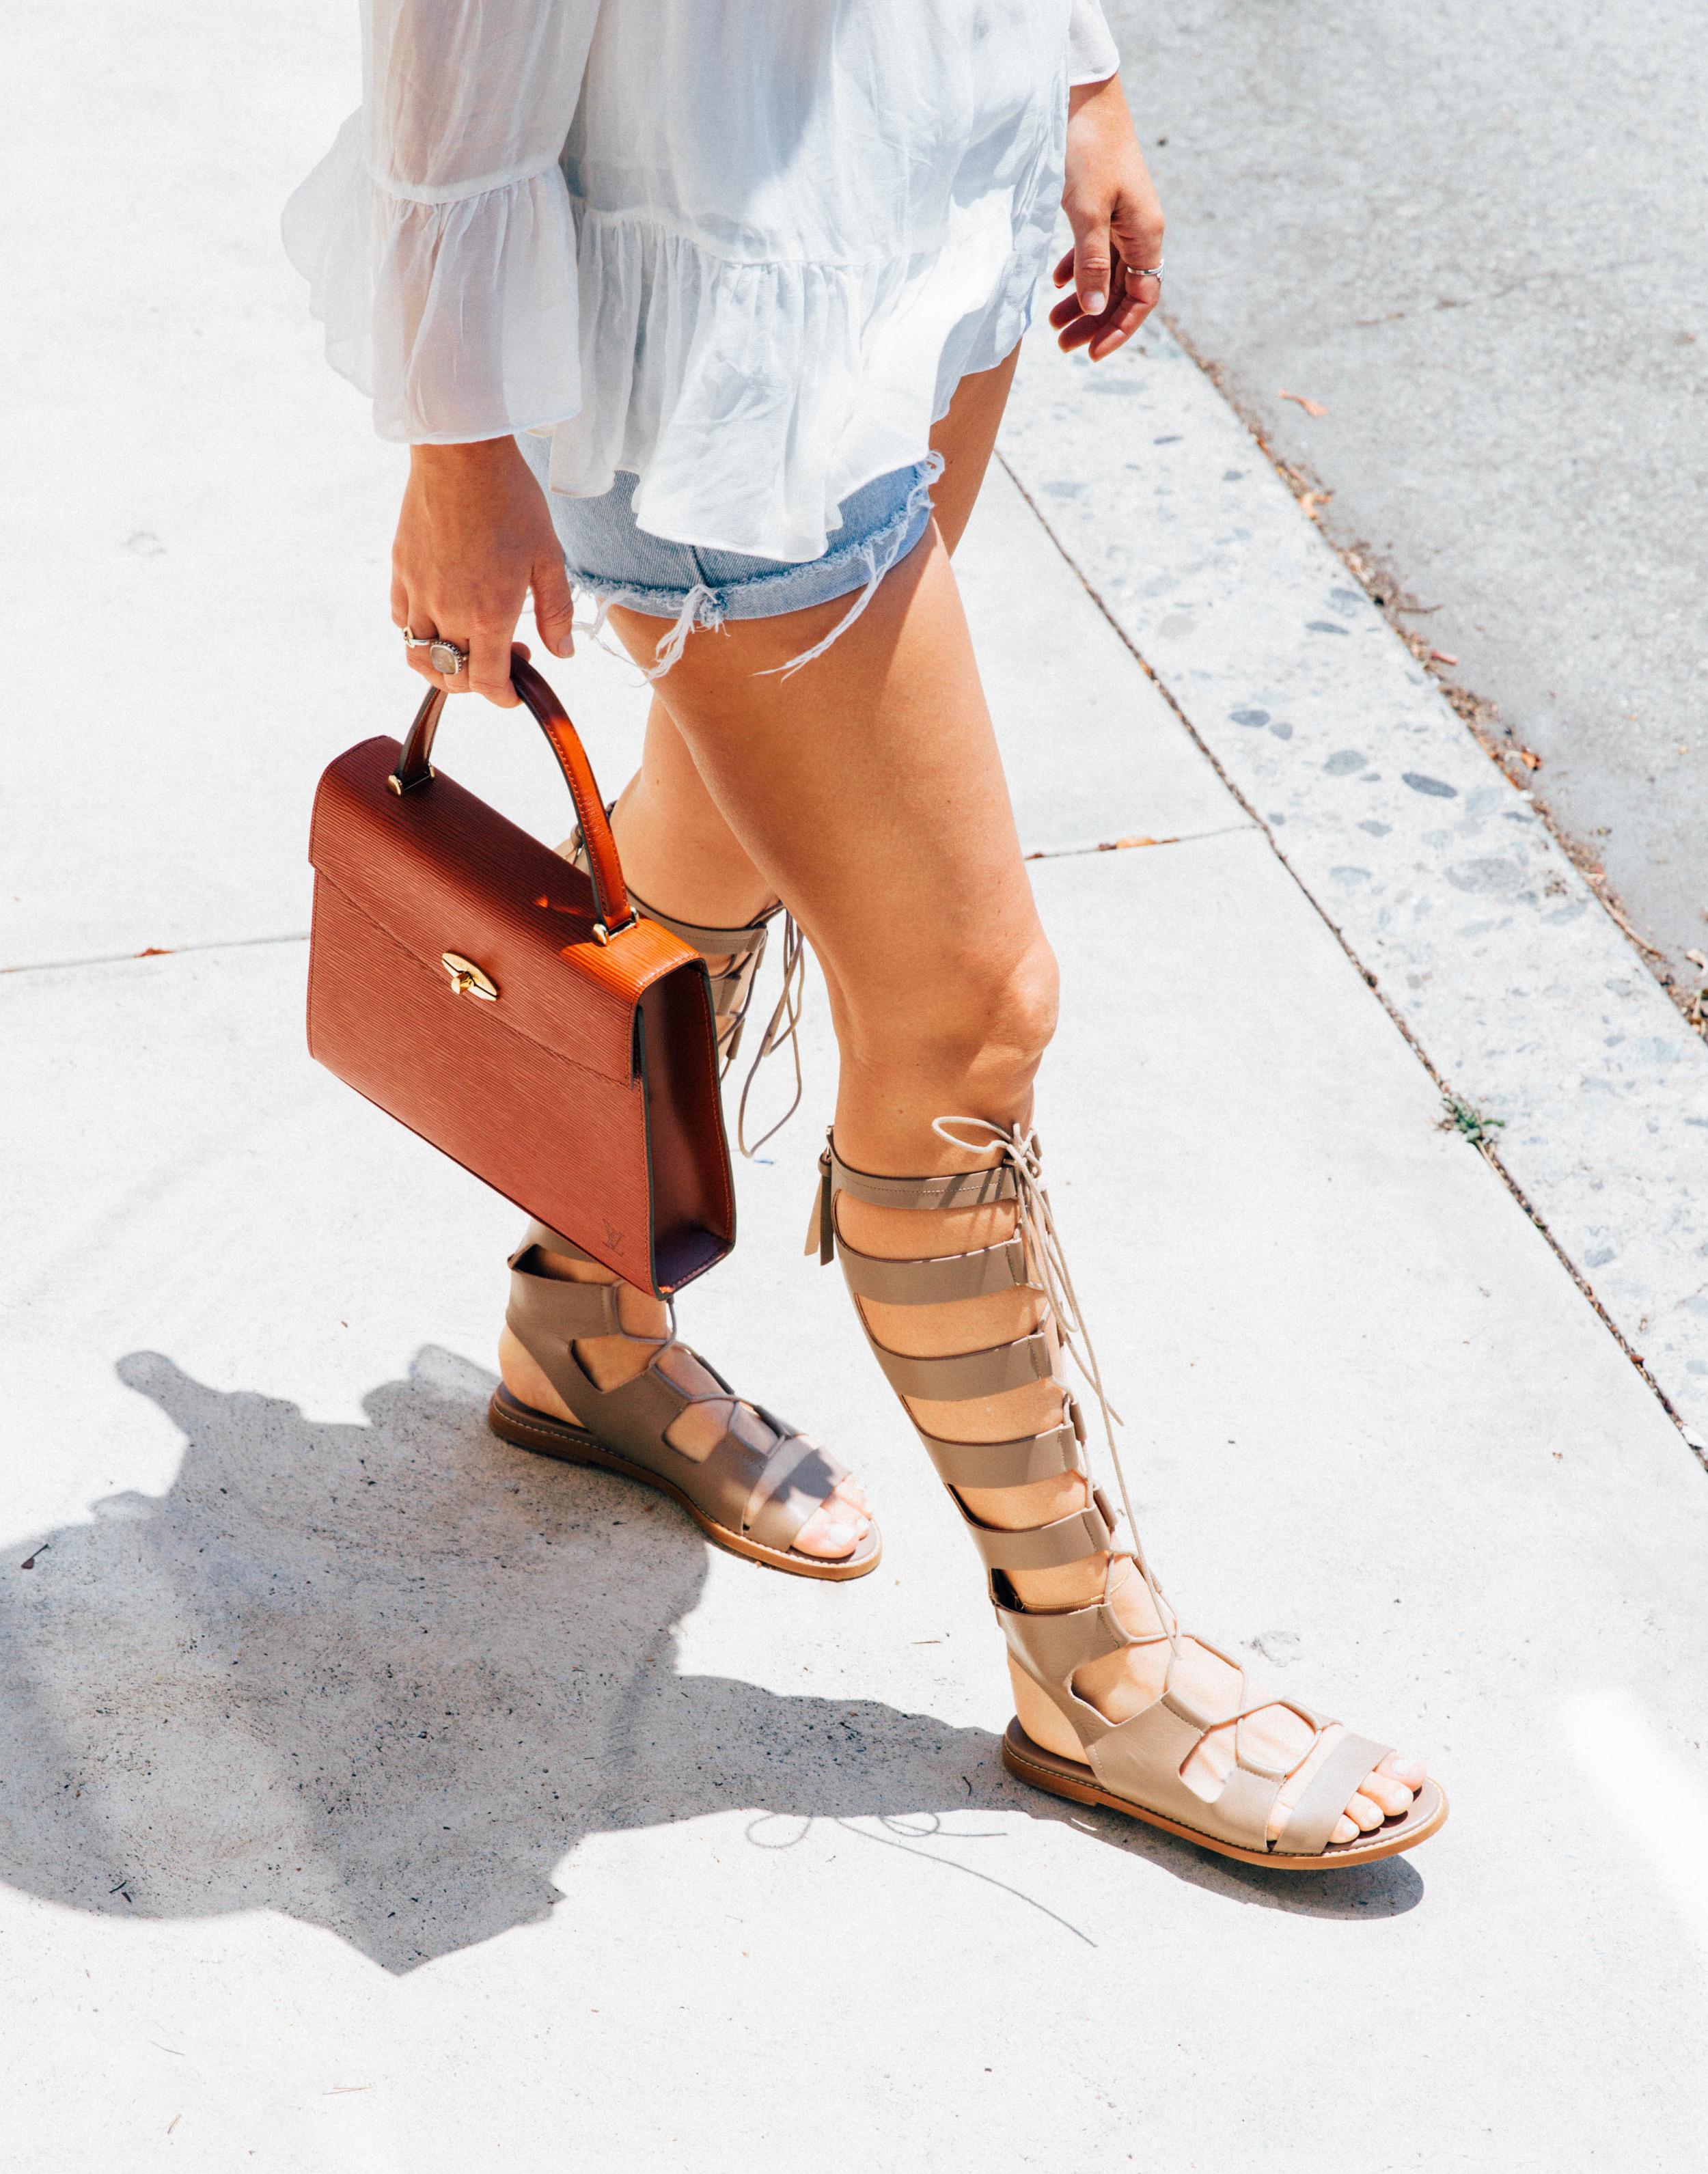 zara sandals gladiators louis vuitton bag detail